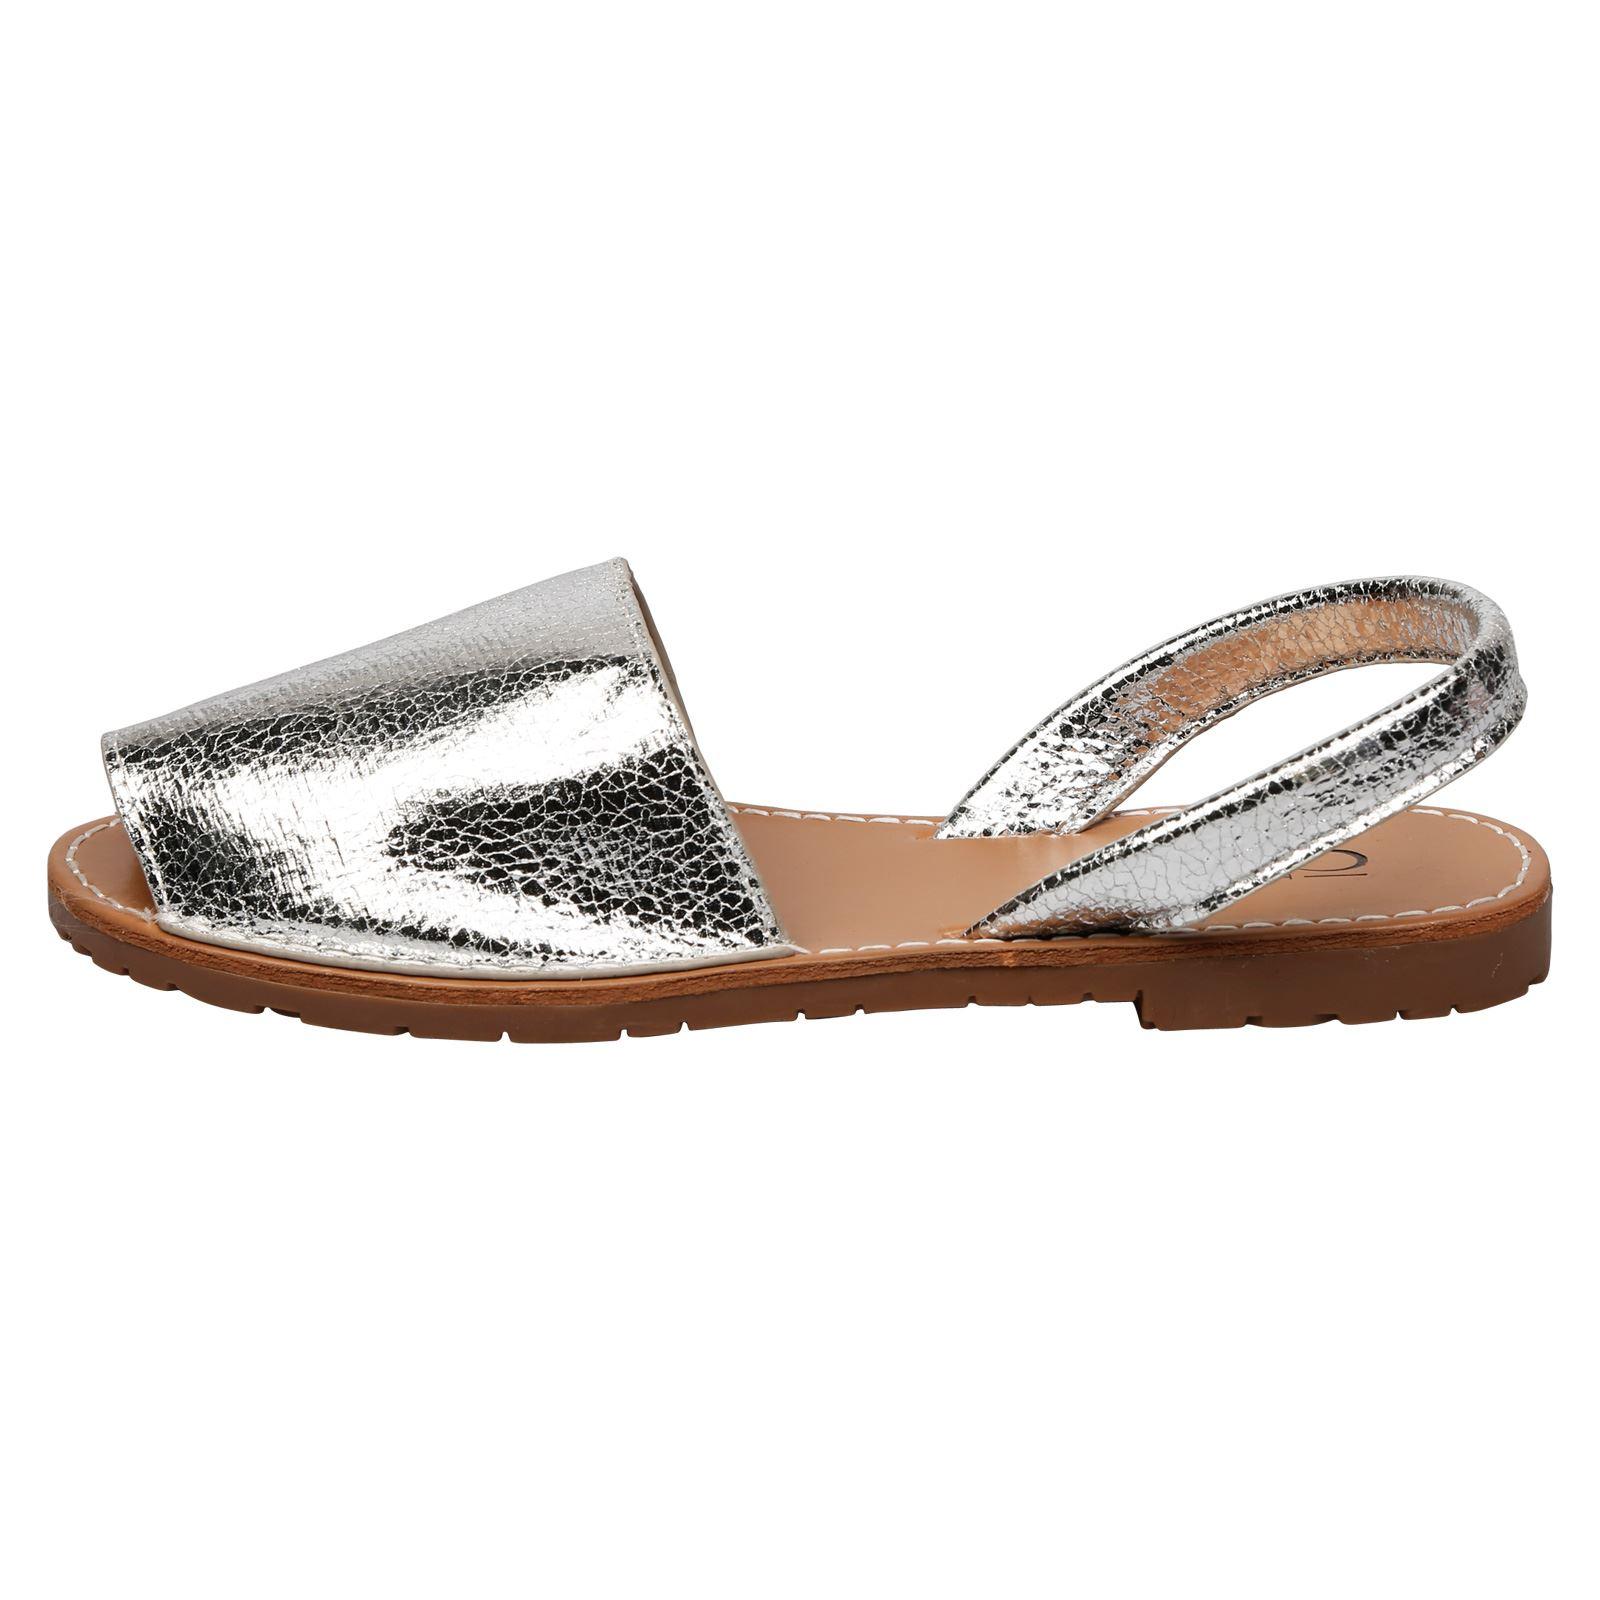 Womens Ladies Summer Menorcan Sandals Sling Back Flip -6141